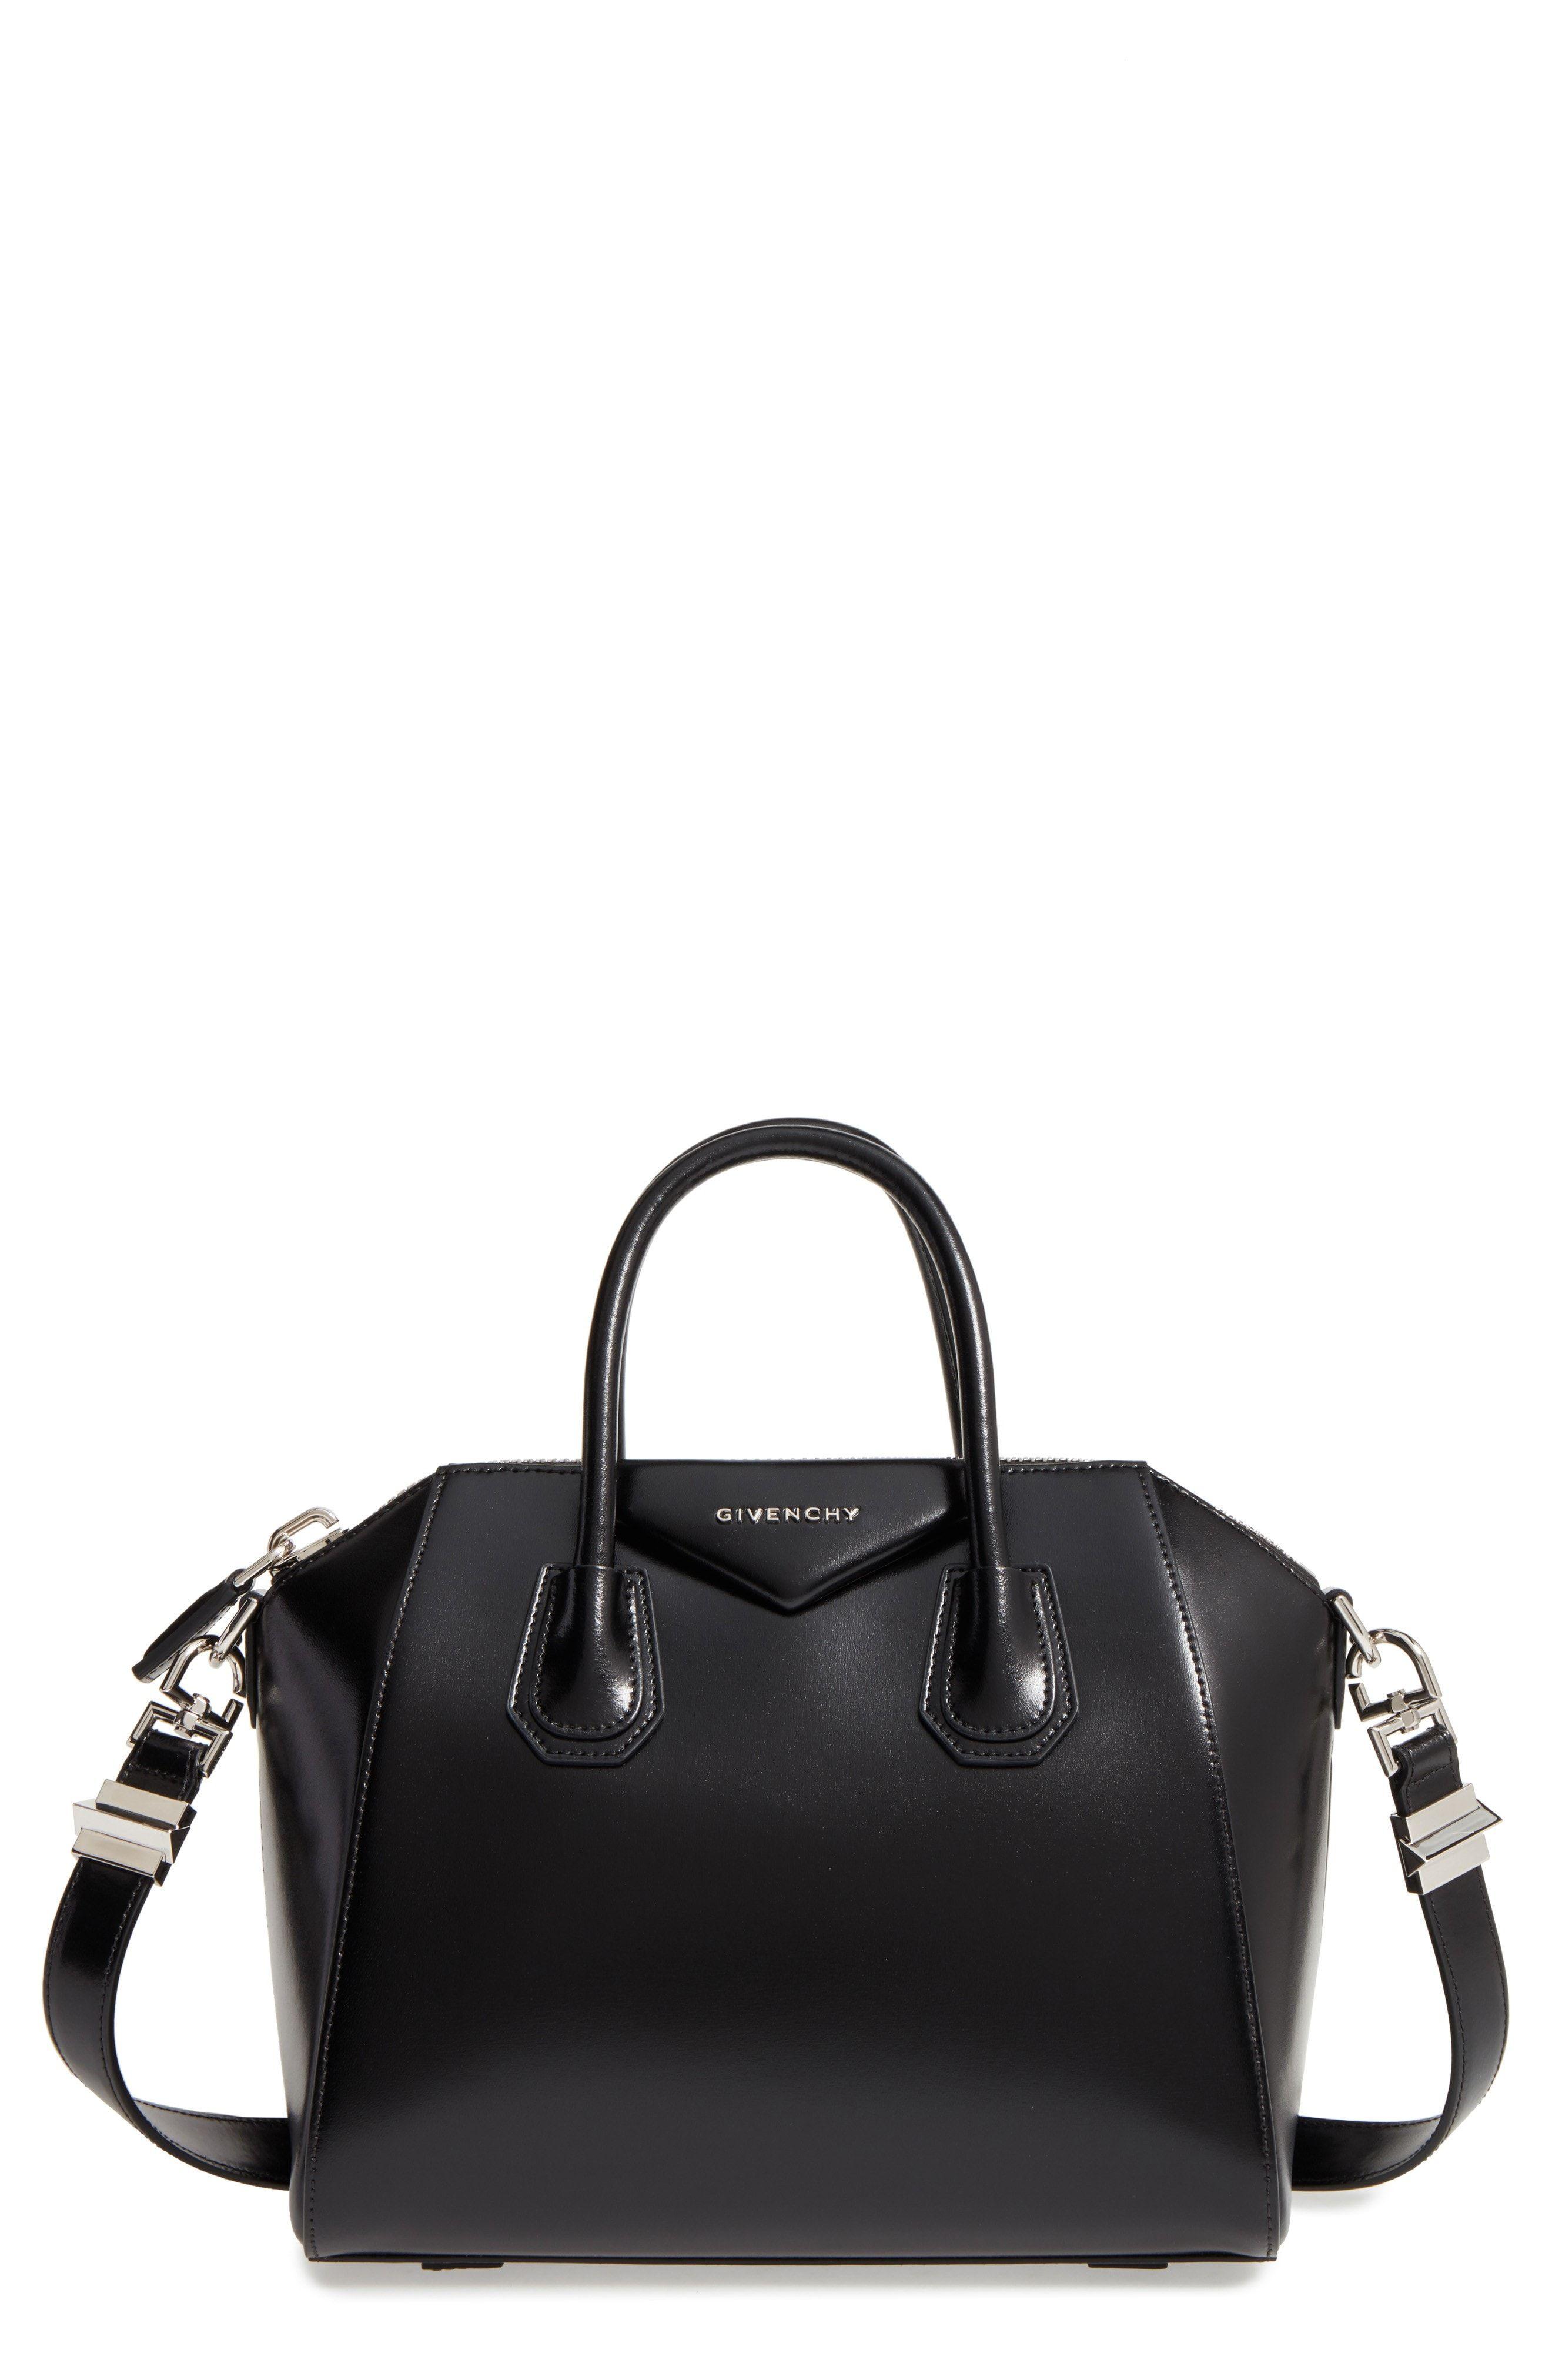 1fd99246d82 Givenchy Small Antigona Box Leather Satchel - Black | Bags | Leather ...